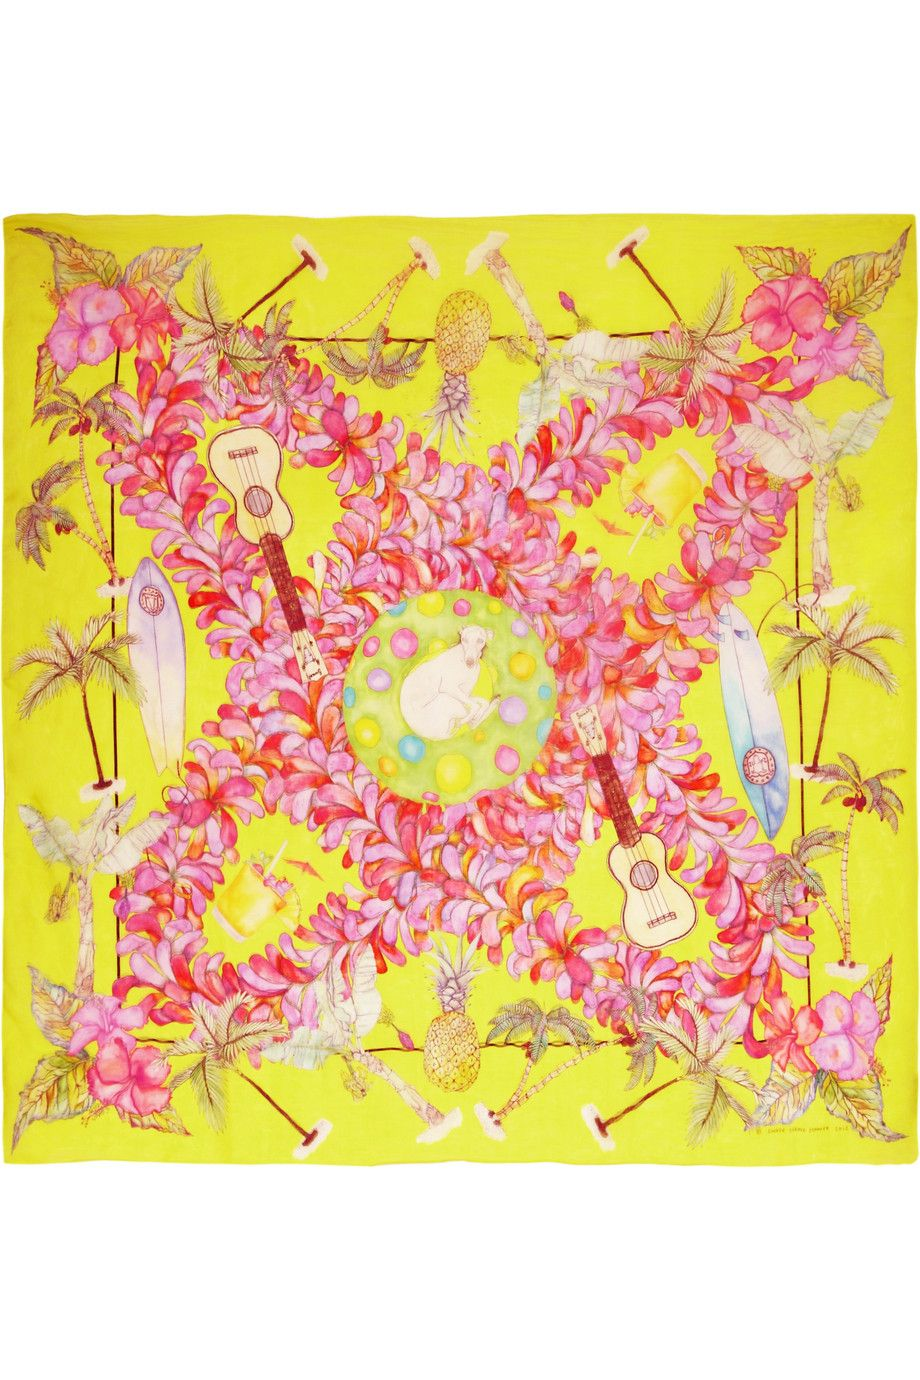 Canary Honolulu printed silk-chiffon scarf, SWASH London SS12 (P.S. Spot the Whippet!)